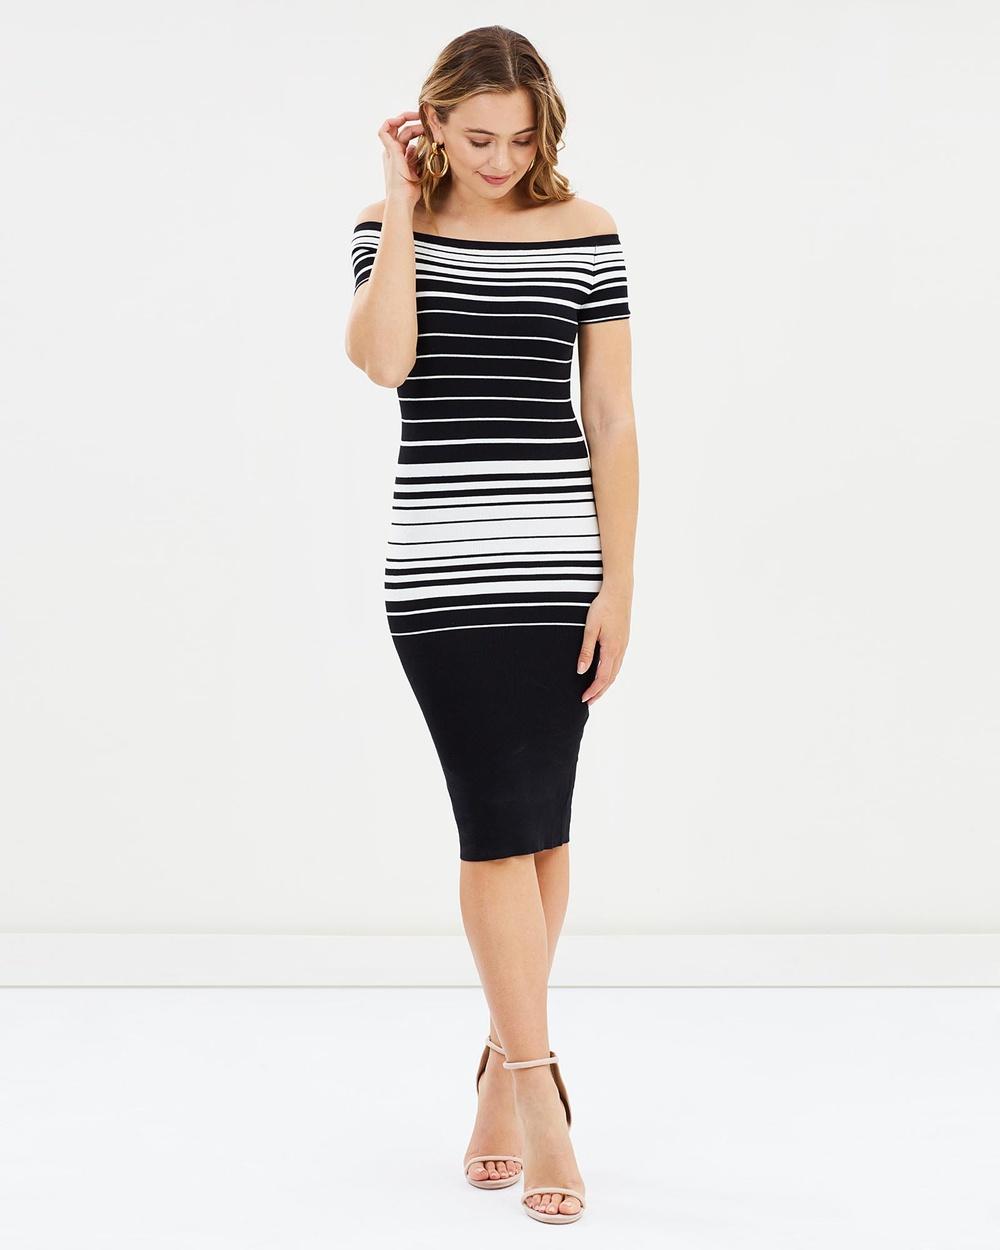 SNDYS Black & White Taylor Dress